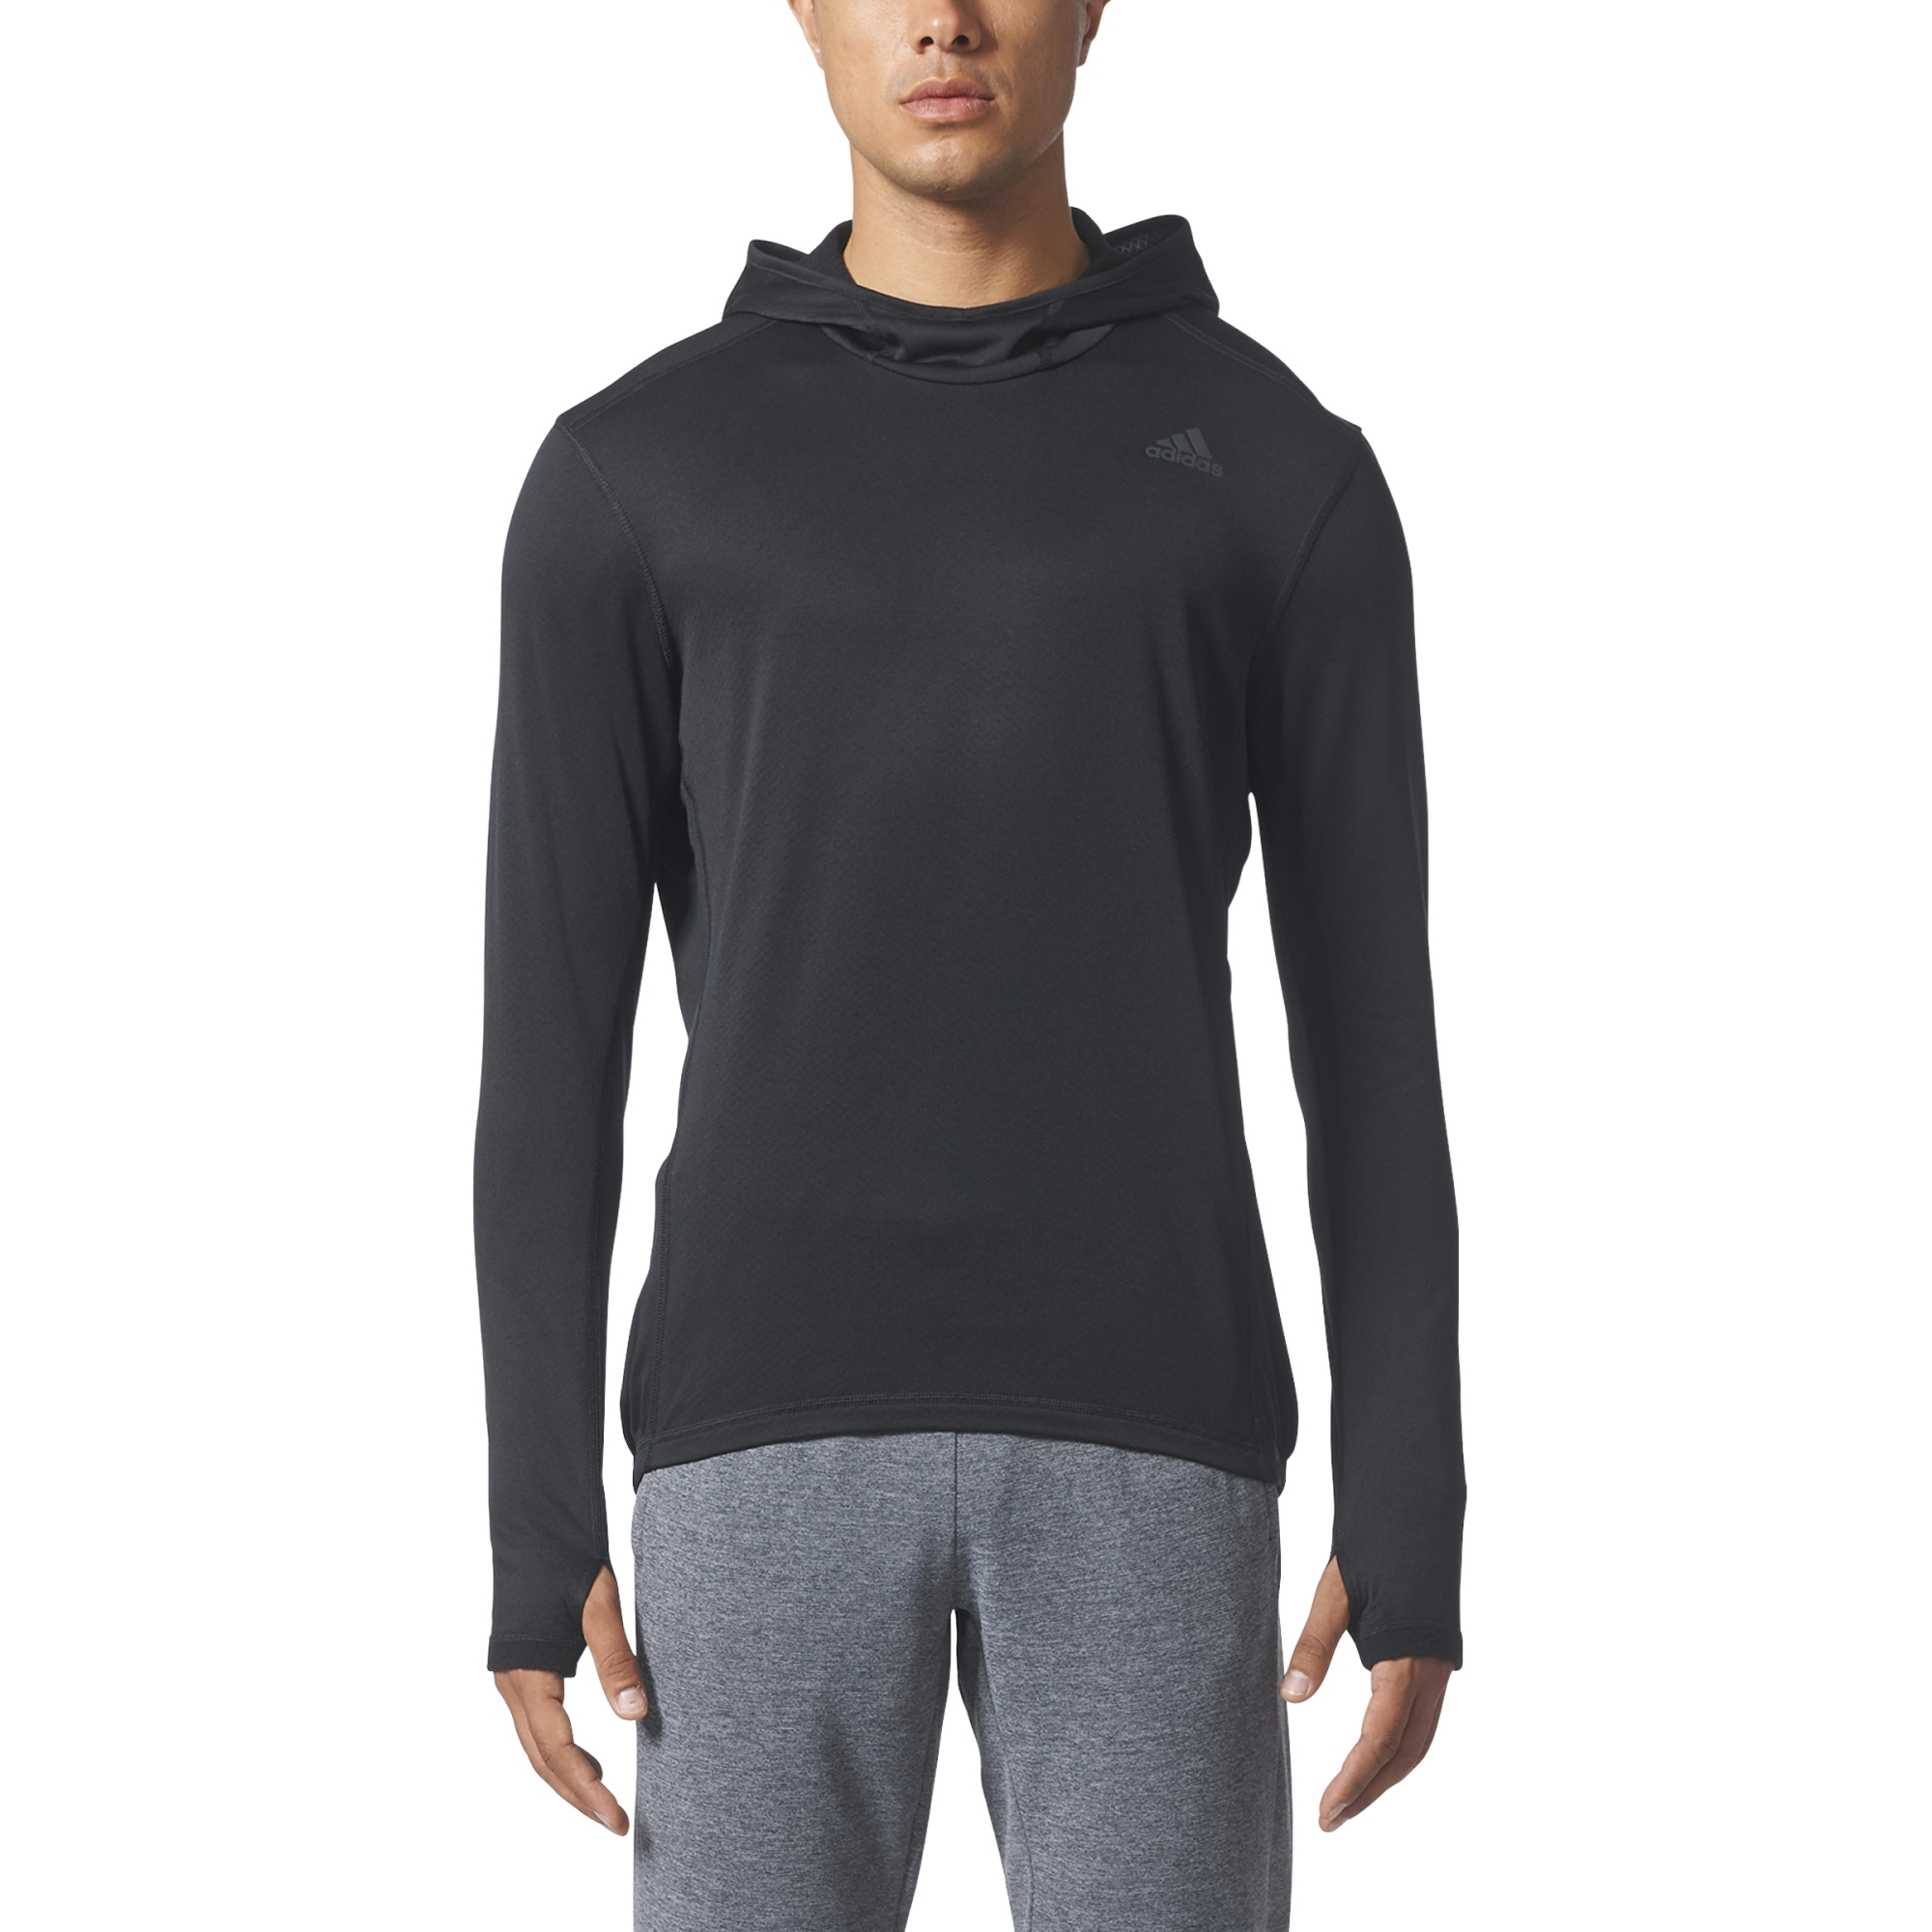 Bluza adidas Response BP8033 XL